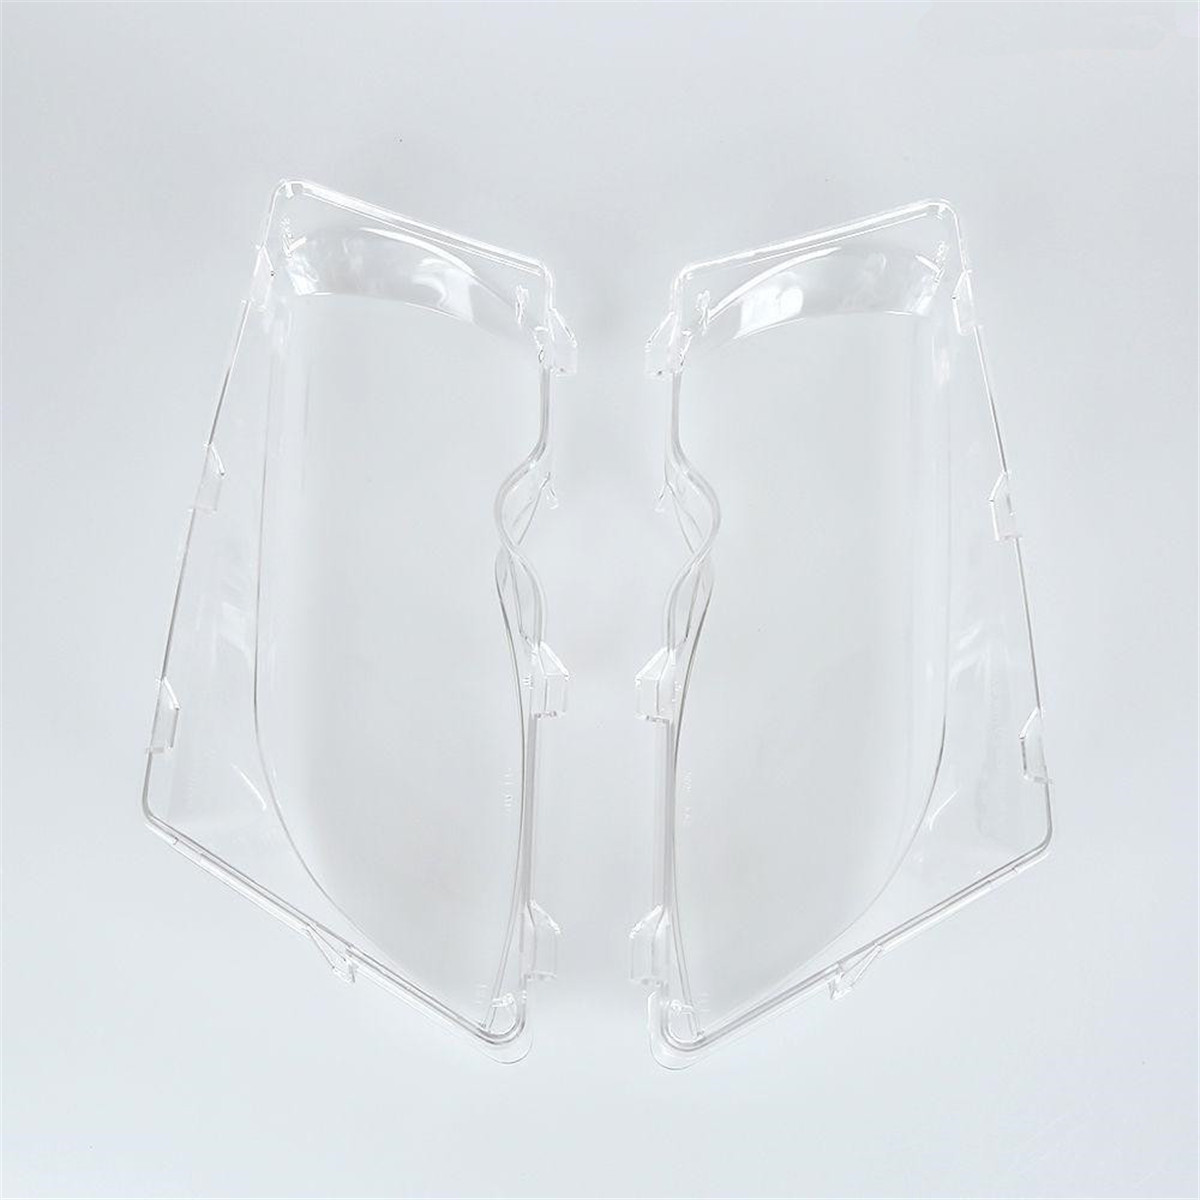 1Pir Car Lights Headlight Shell Lamp Cover Glass For BMW